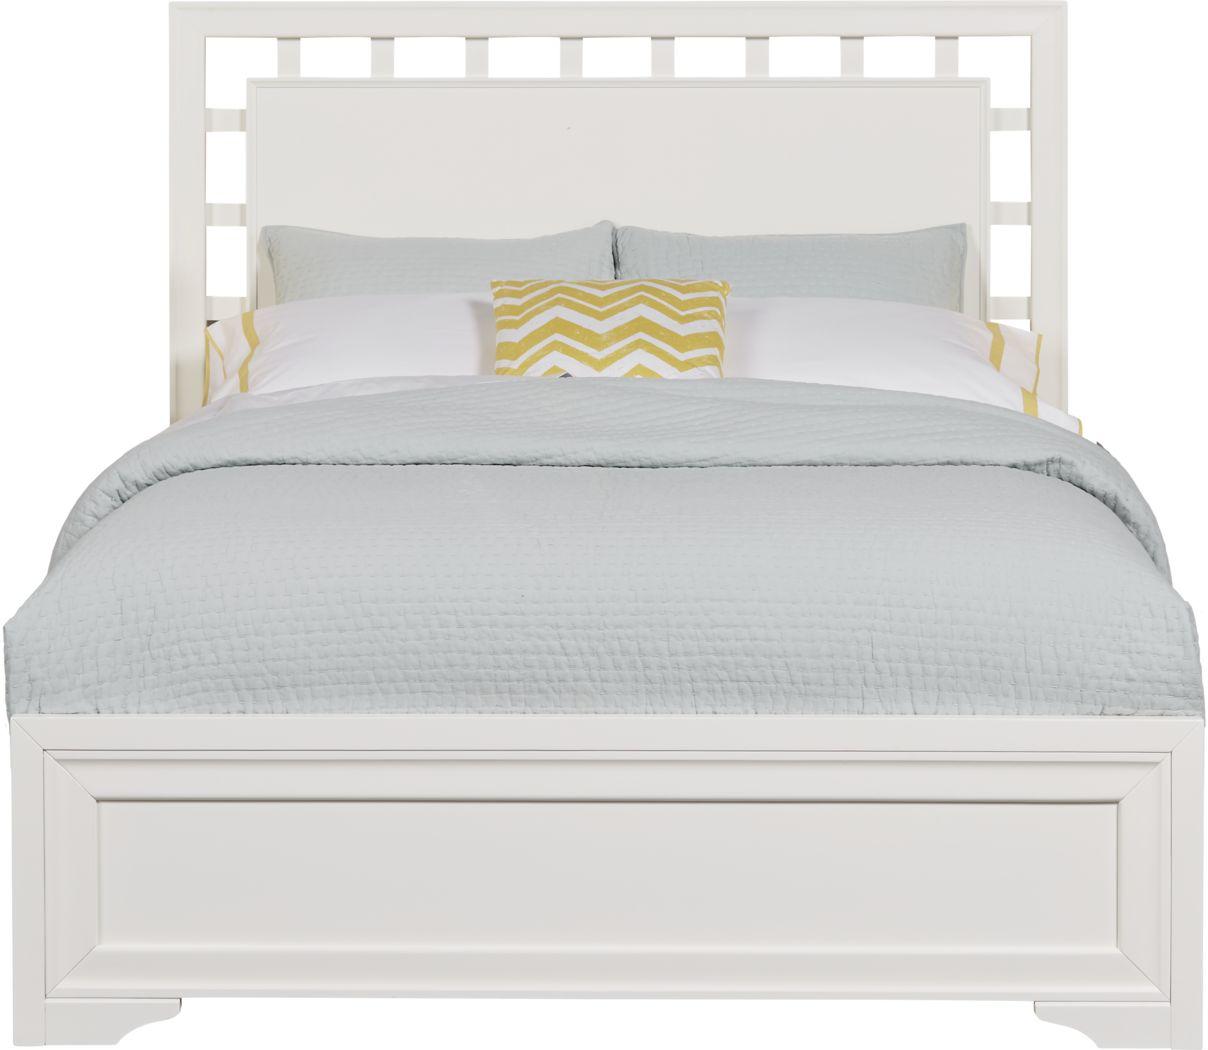 Belcourt White 3 Pc Queen Lattice Bed